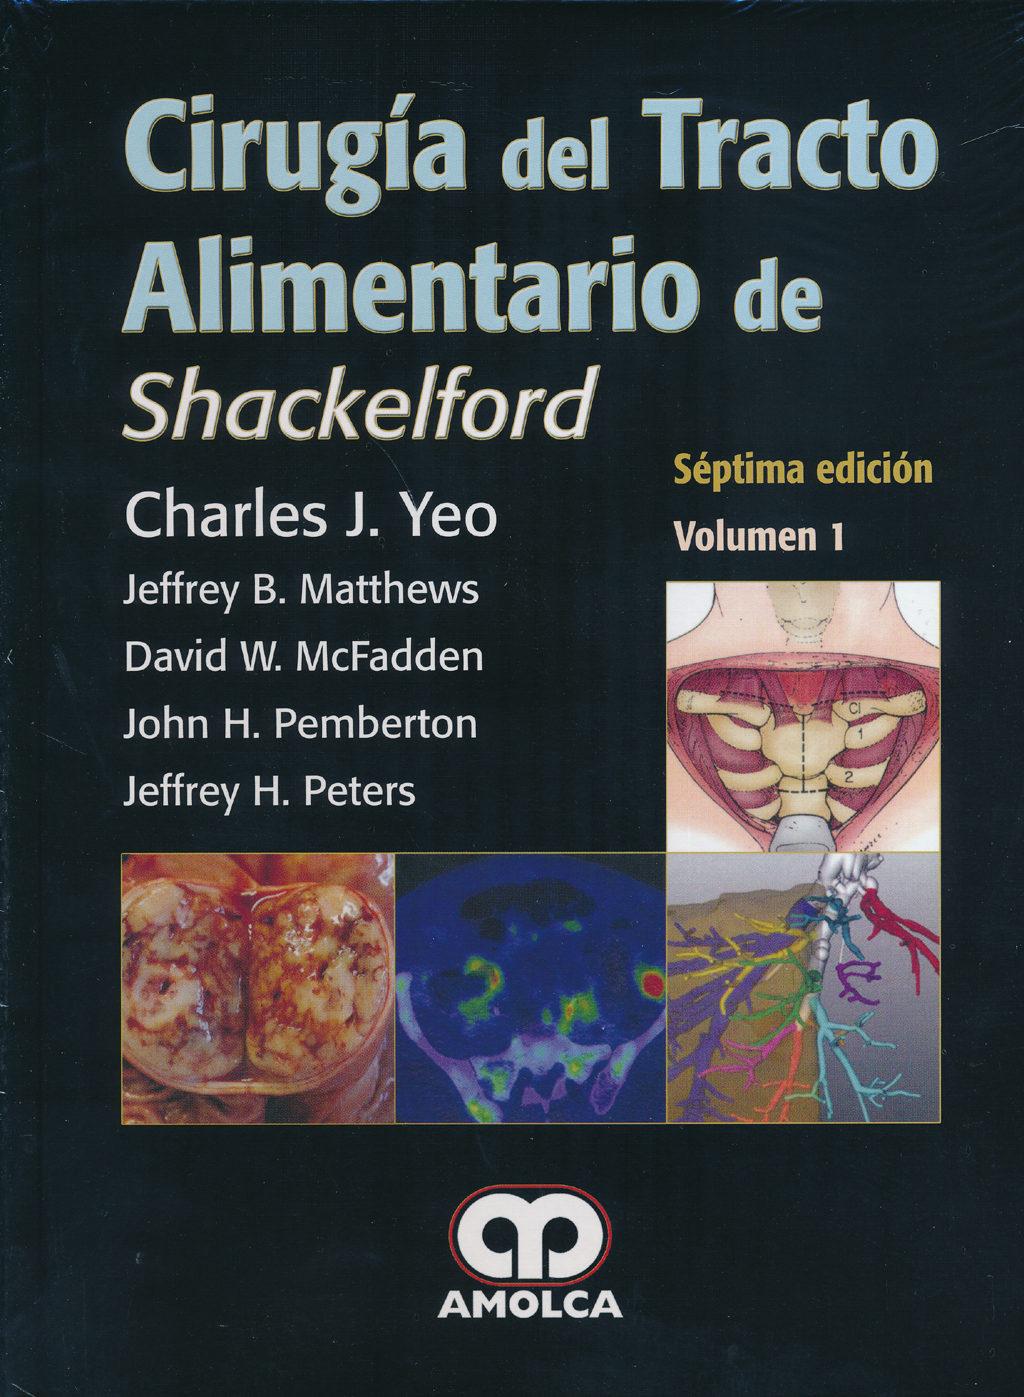 gratis shackelford cirugia